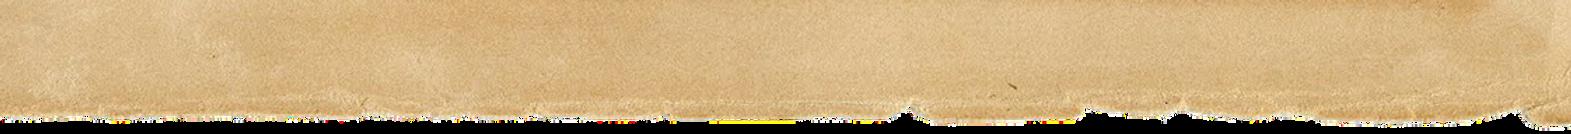 torn_paper_header_WEB.png